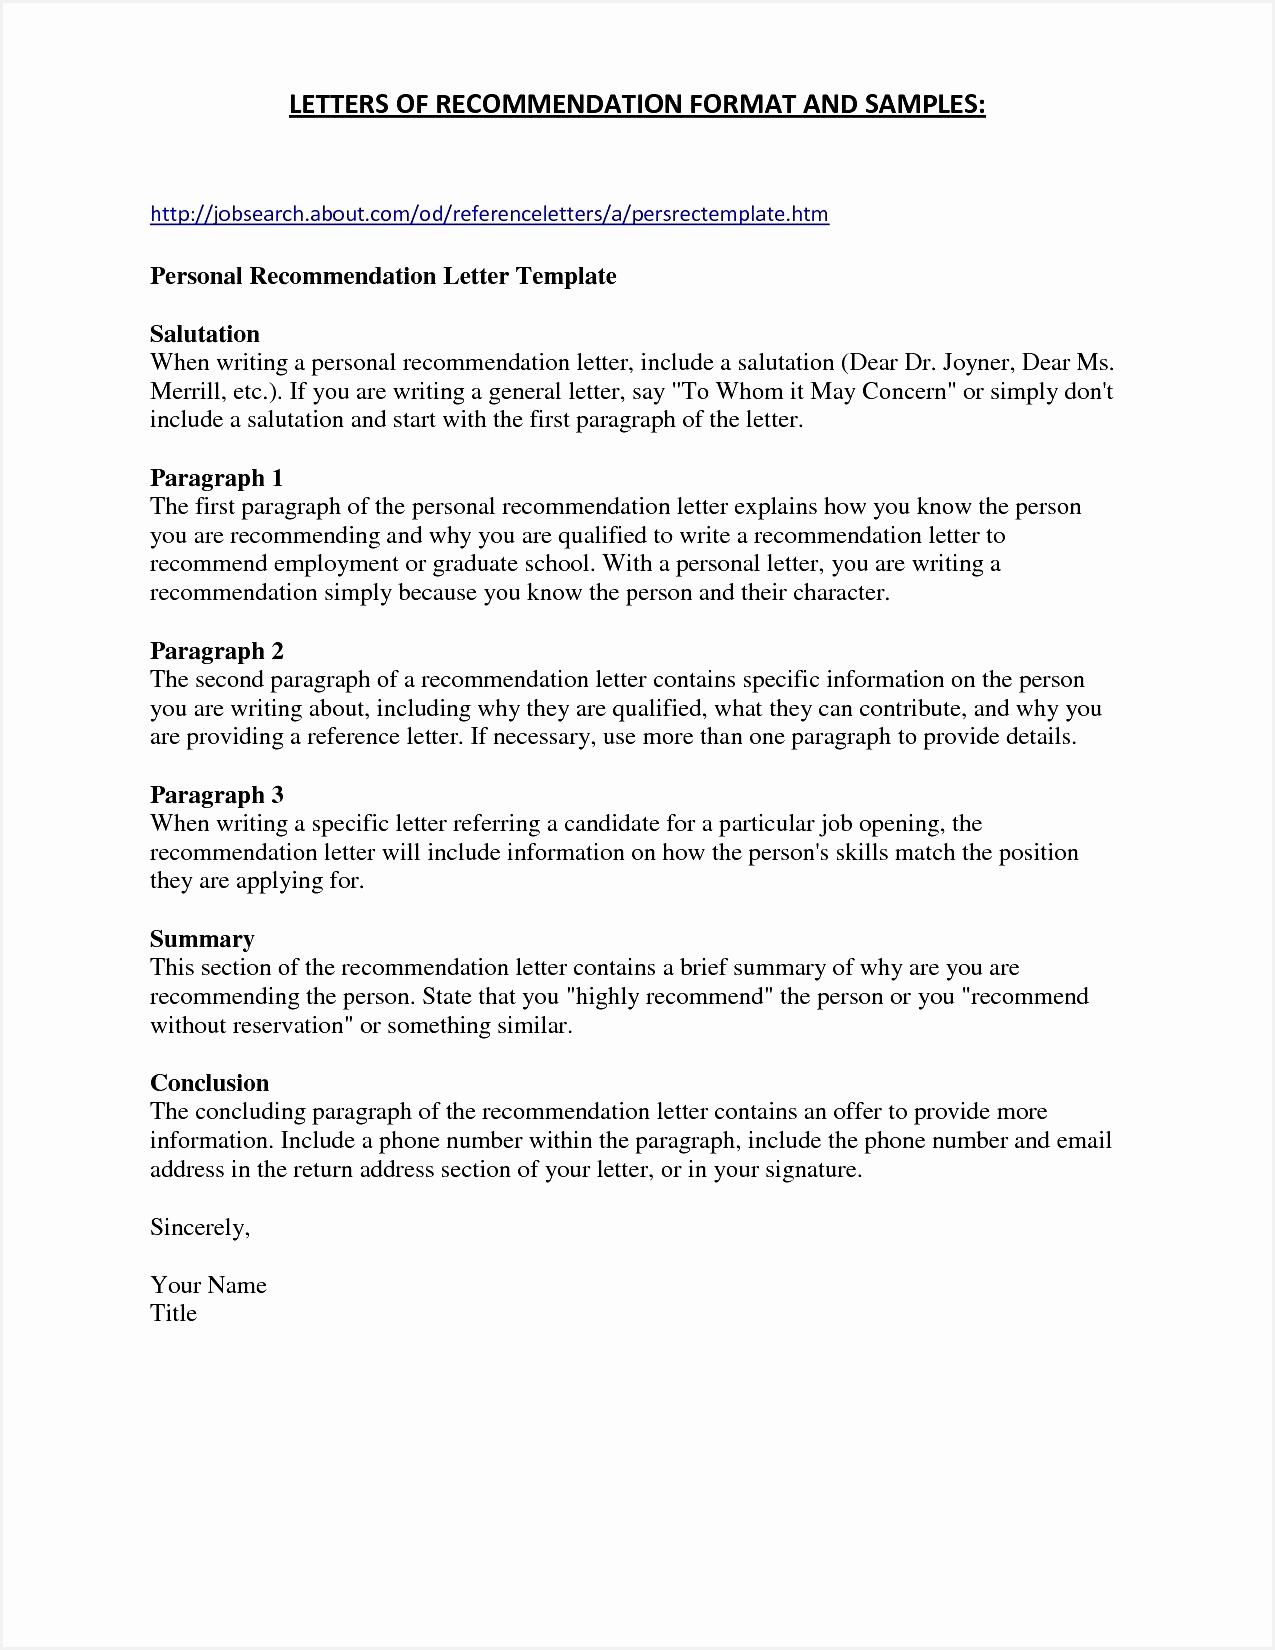 Resume For Nursing Job Application New Nursing Job Application Letter Samples New Graduate Resume Template16501275